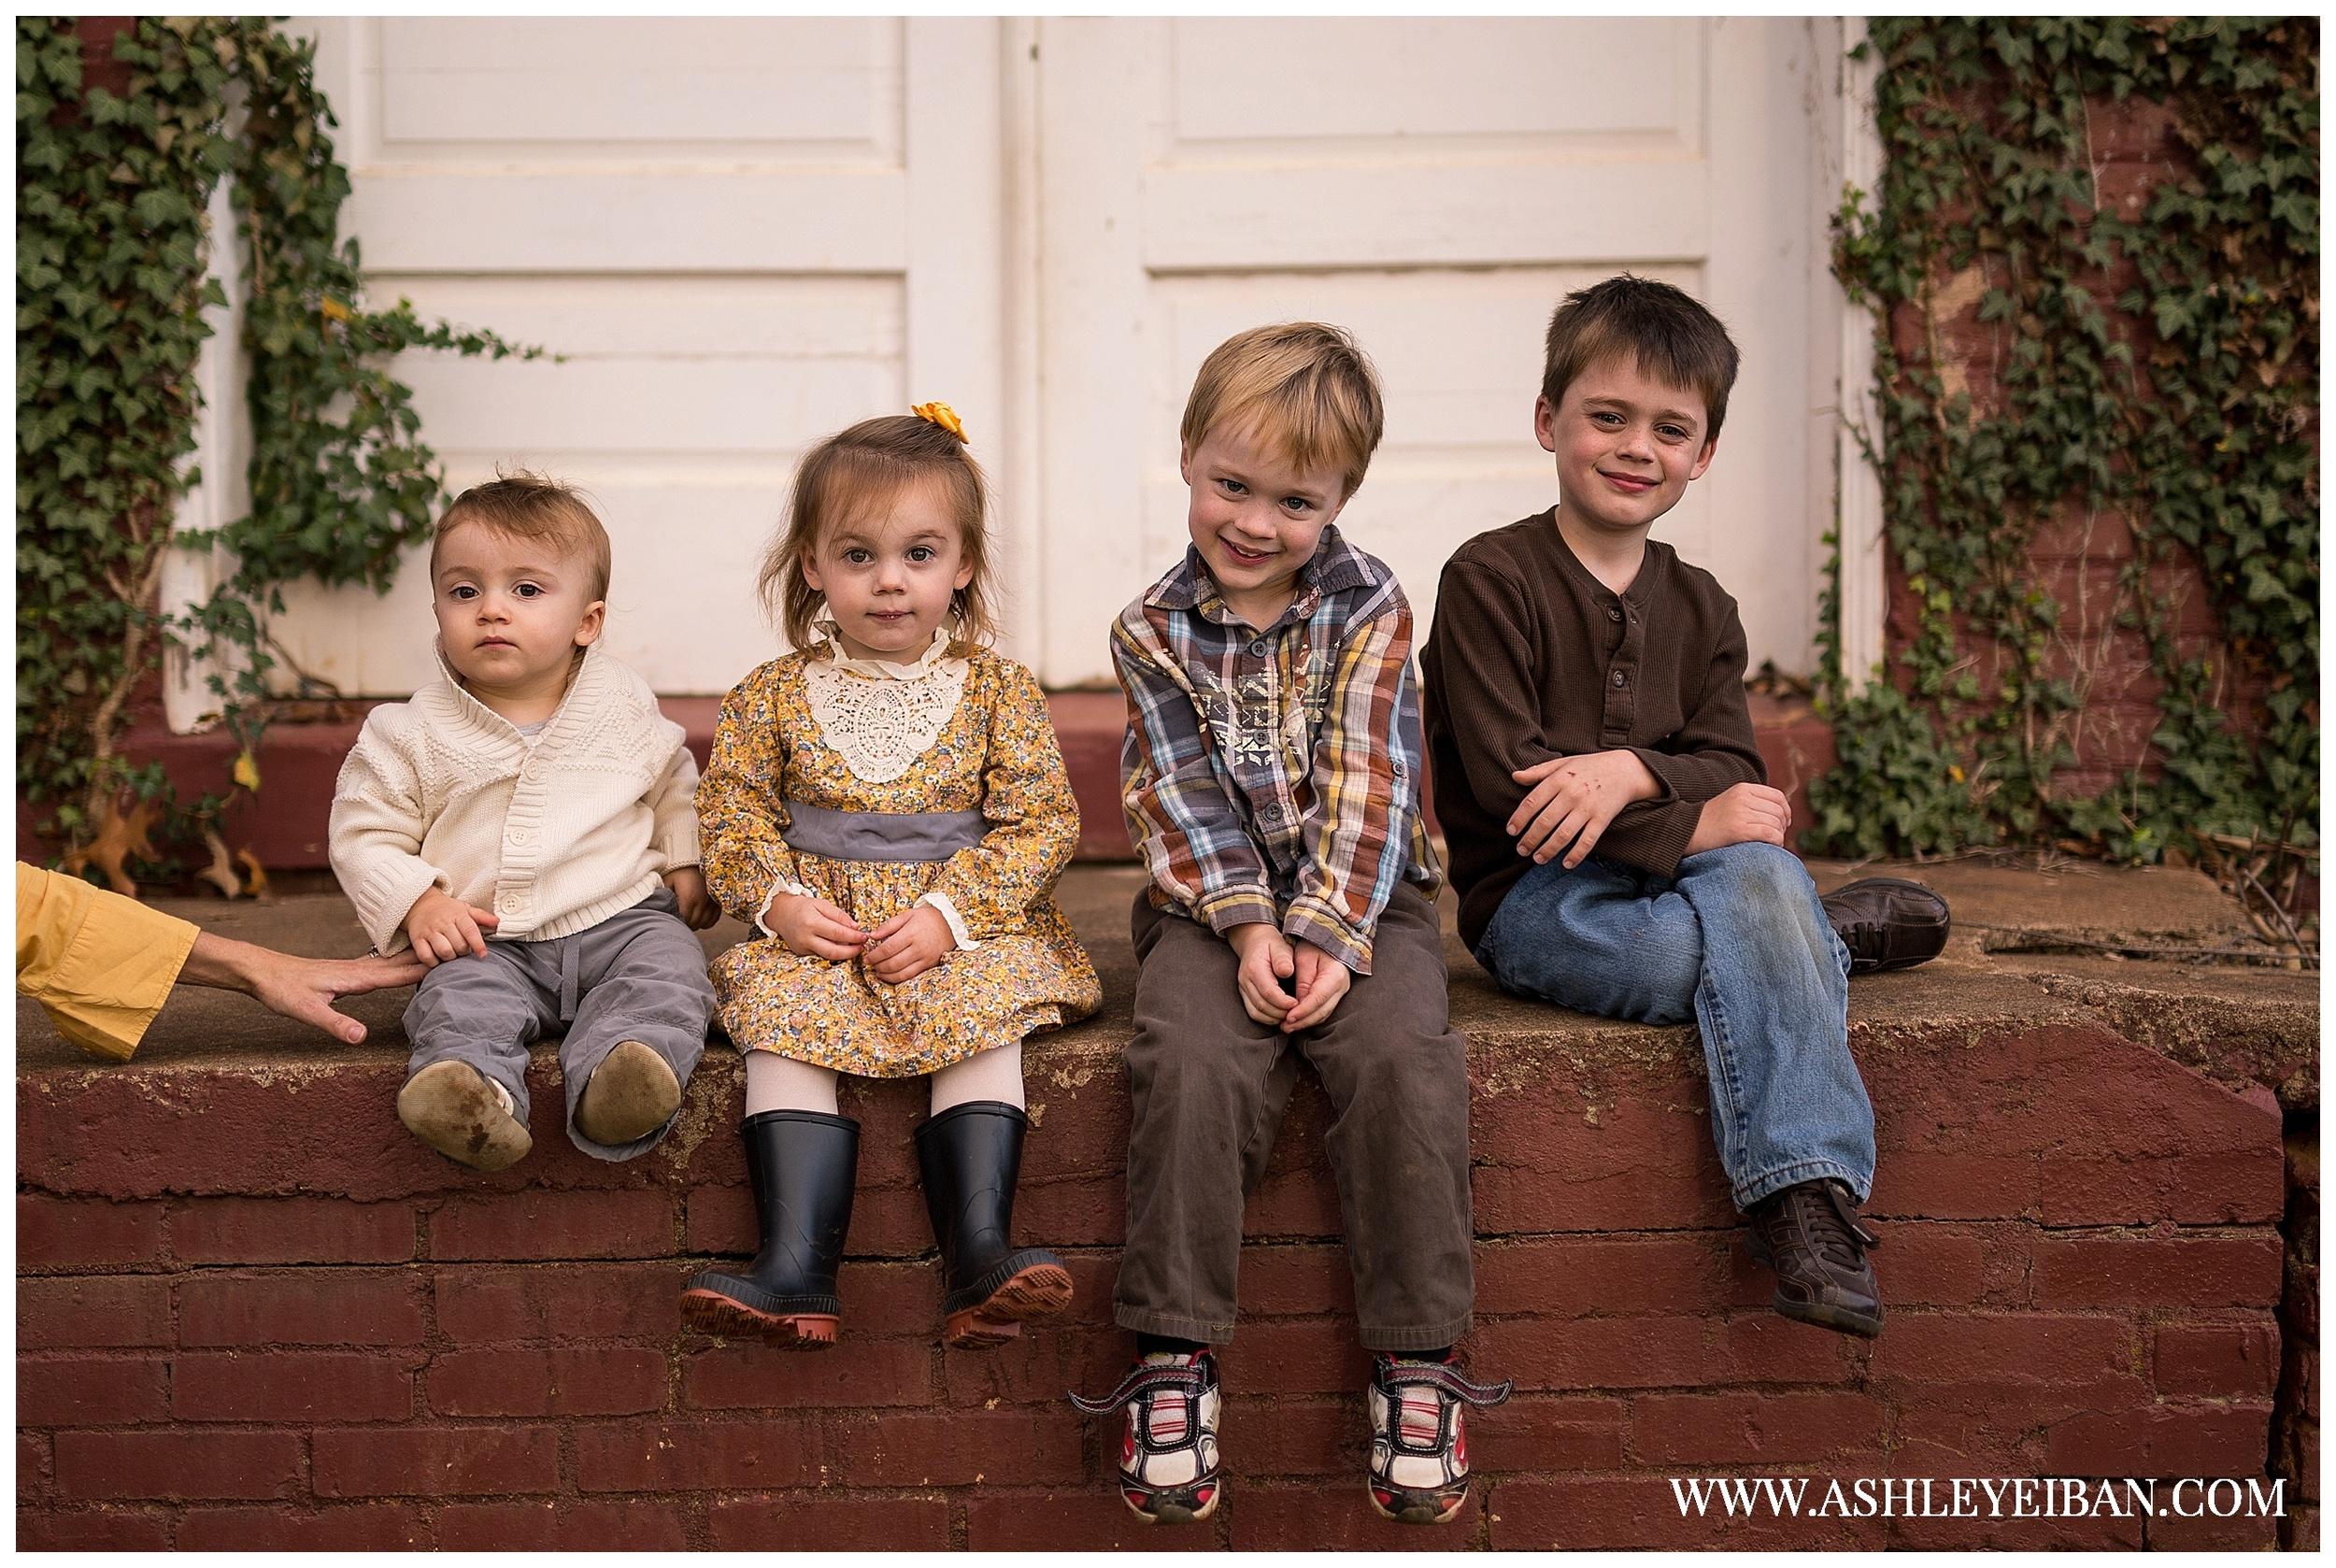 xLynchburg, Virginia Family Photographer || Central Virginia Wedding & Portrait Photographer  || Ashley Eiban Photography || www.ashleyeiban.com